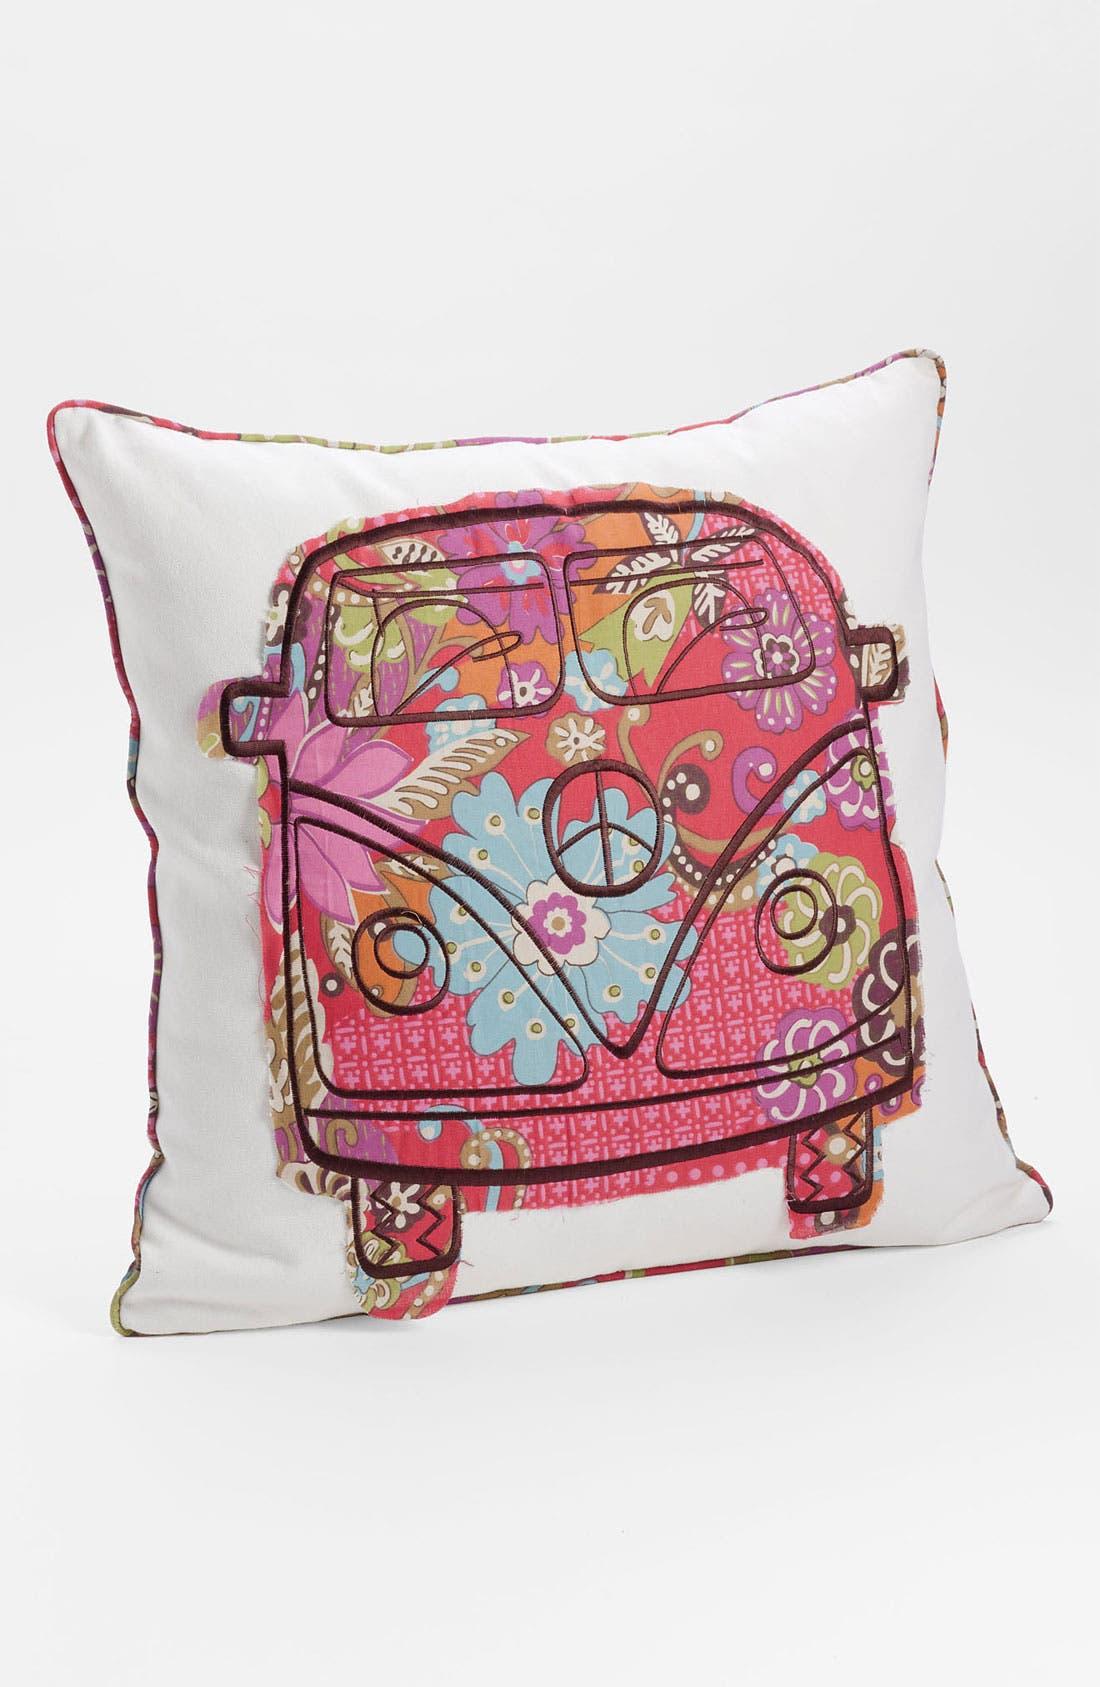 Alternate Image 1 Selected - Levtex 'Bus' Appliqué Pillow